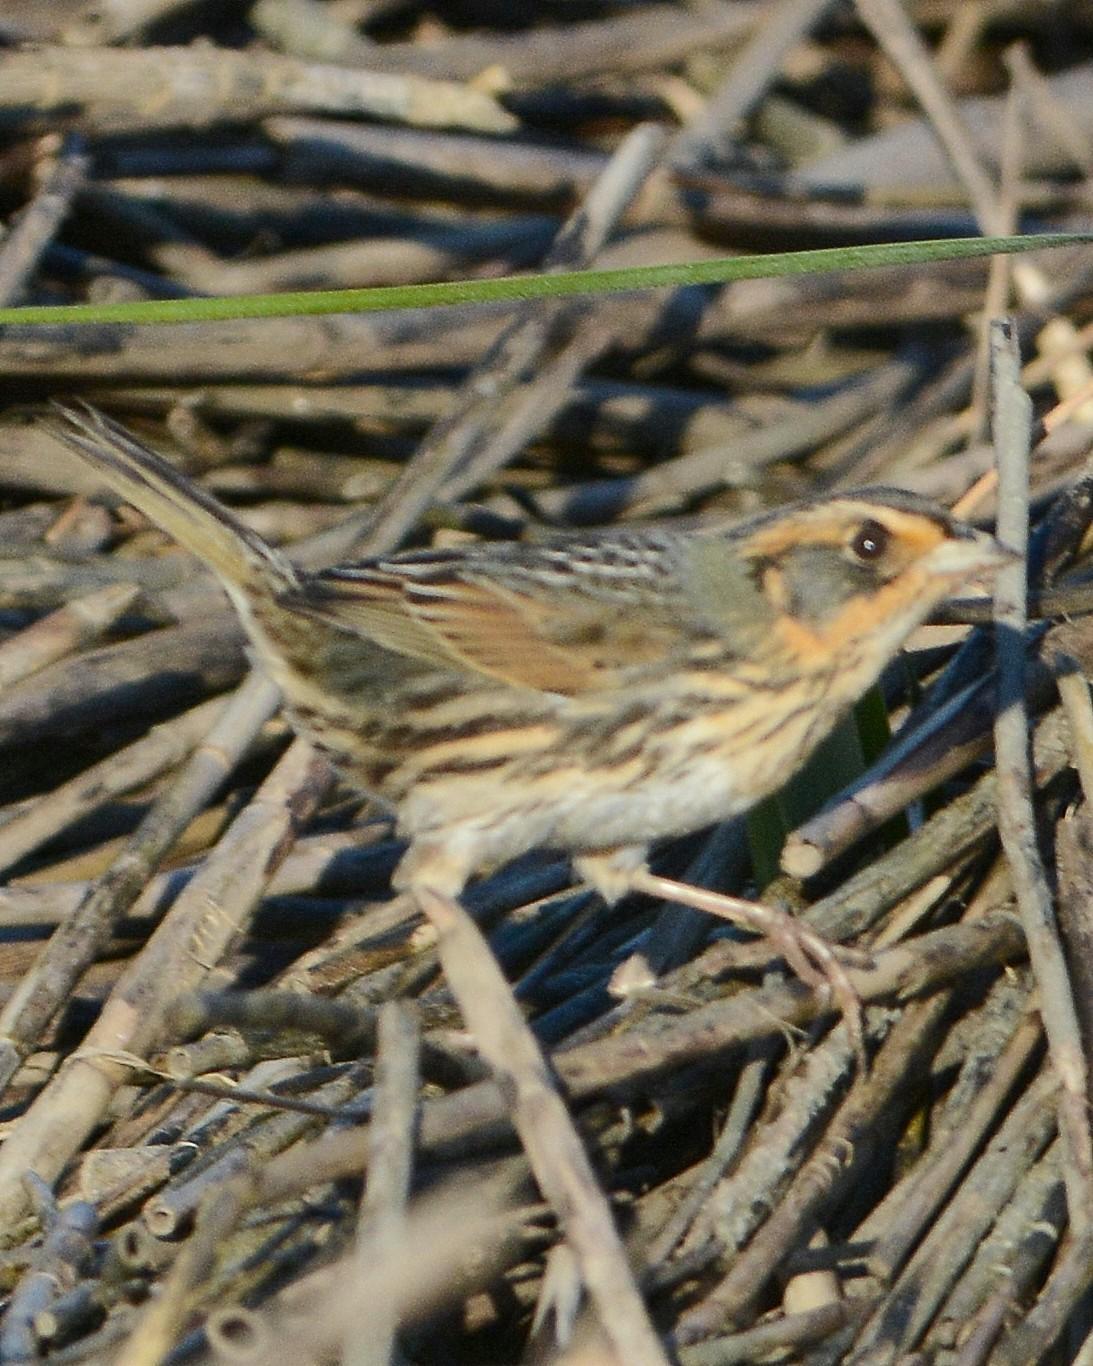 Saltmarsh Sparrow Photo by David Hollie